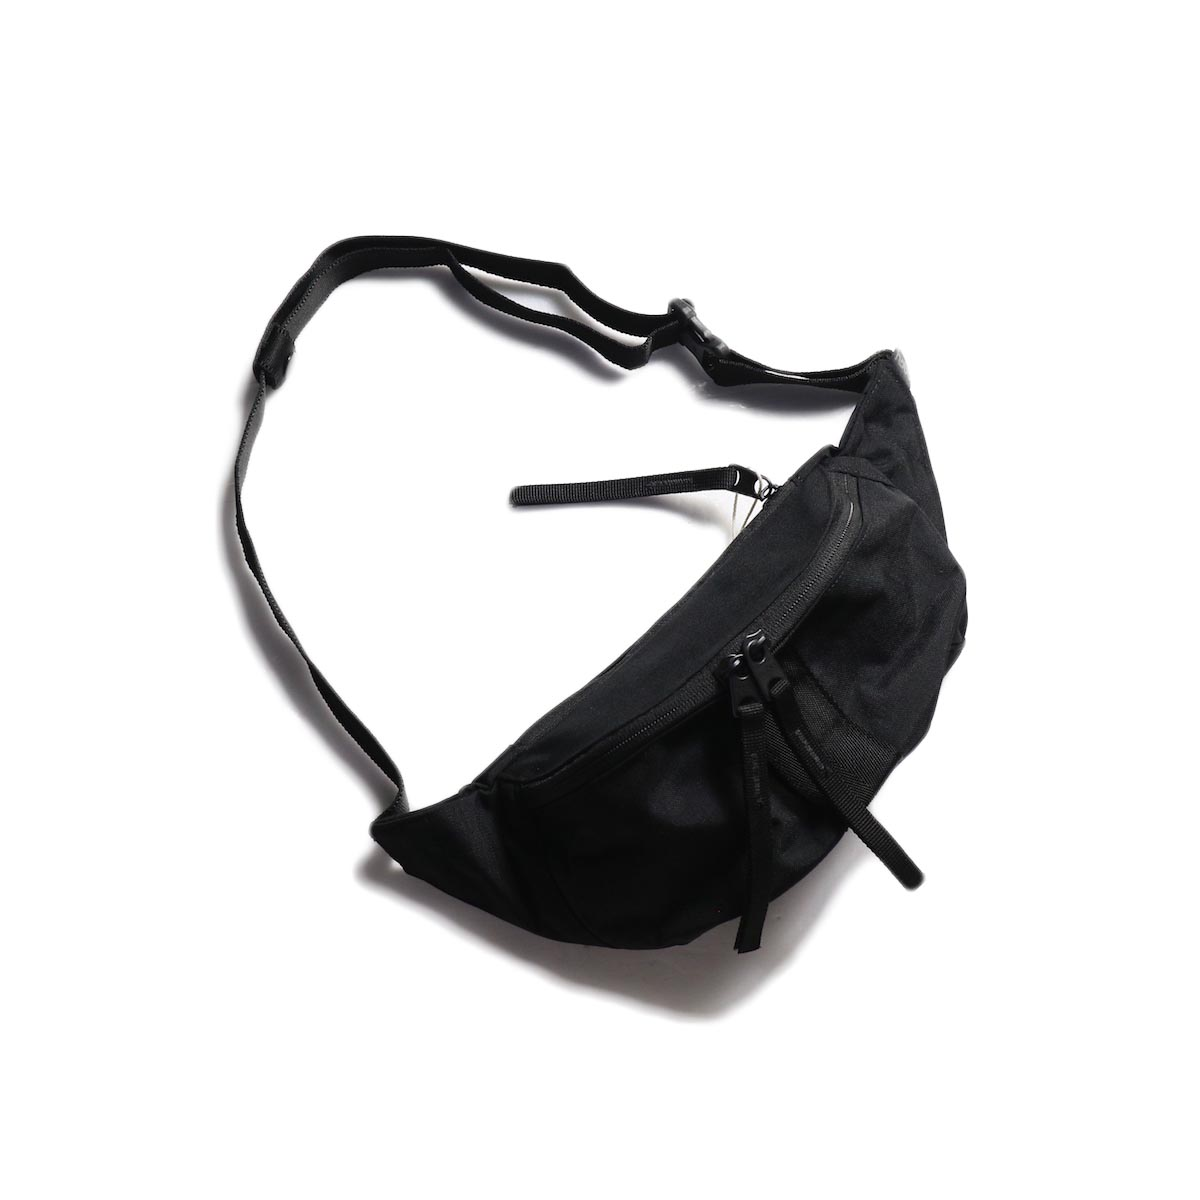 HOBO / Polyester Canvas Waist Bag -Black